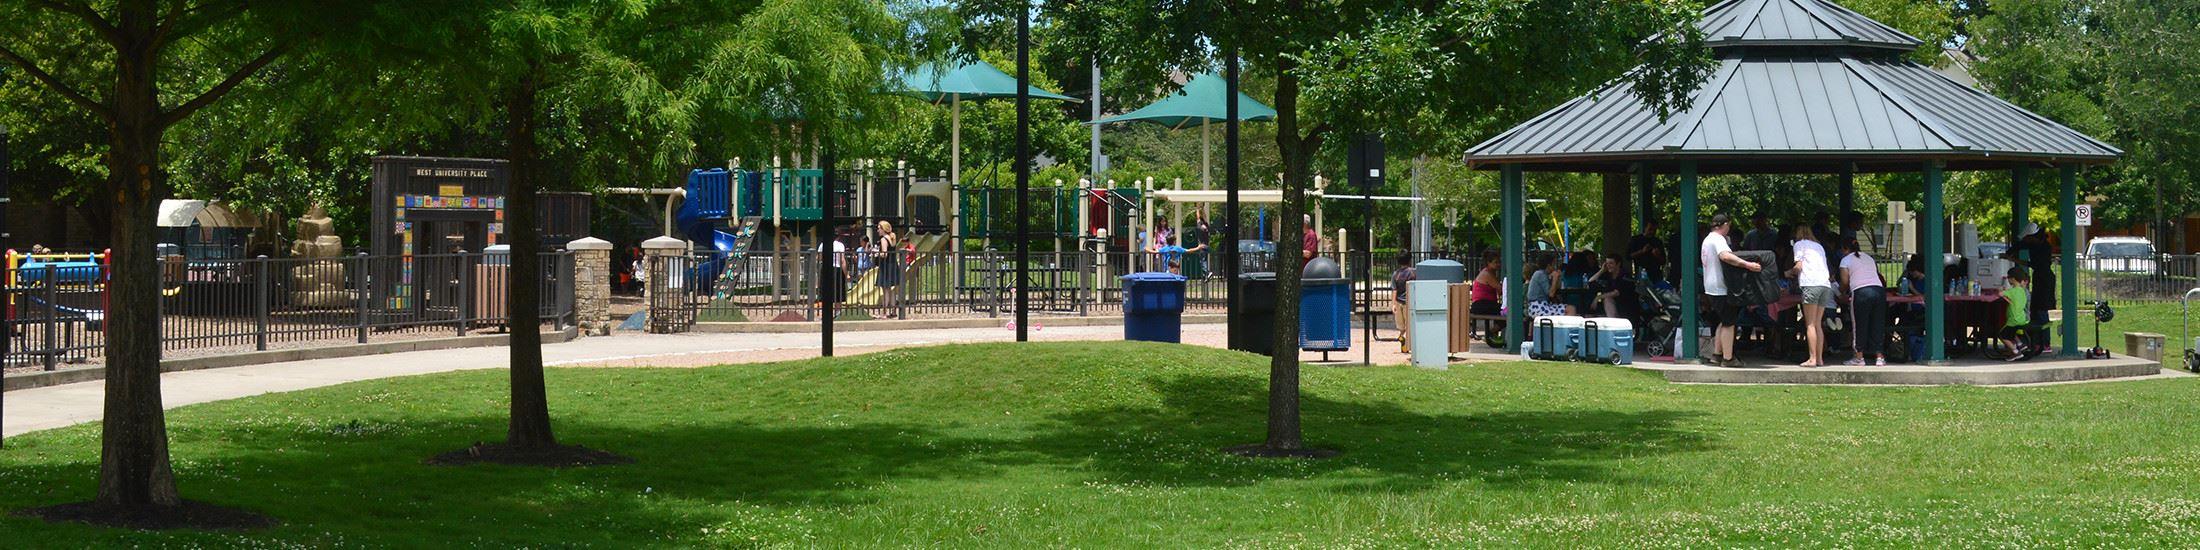 Recreation Center | West University Place, TX - Official Website